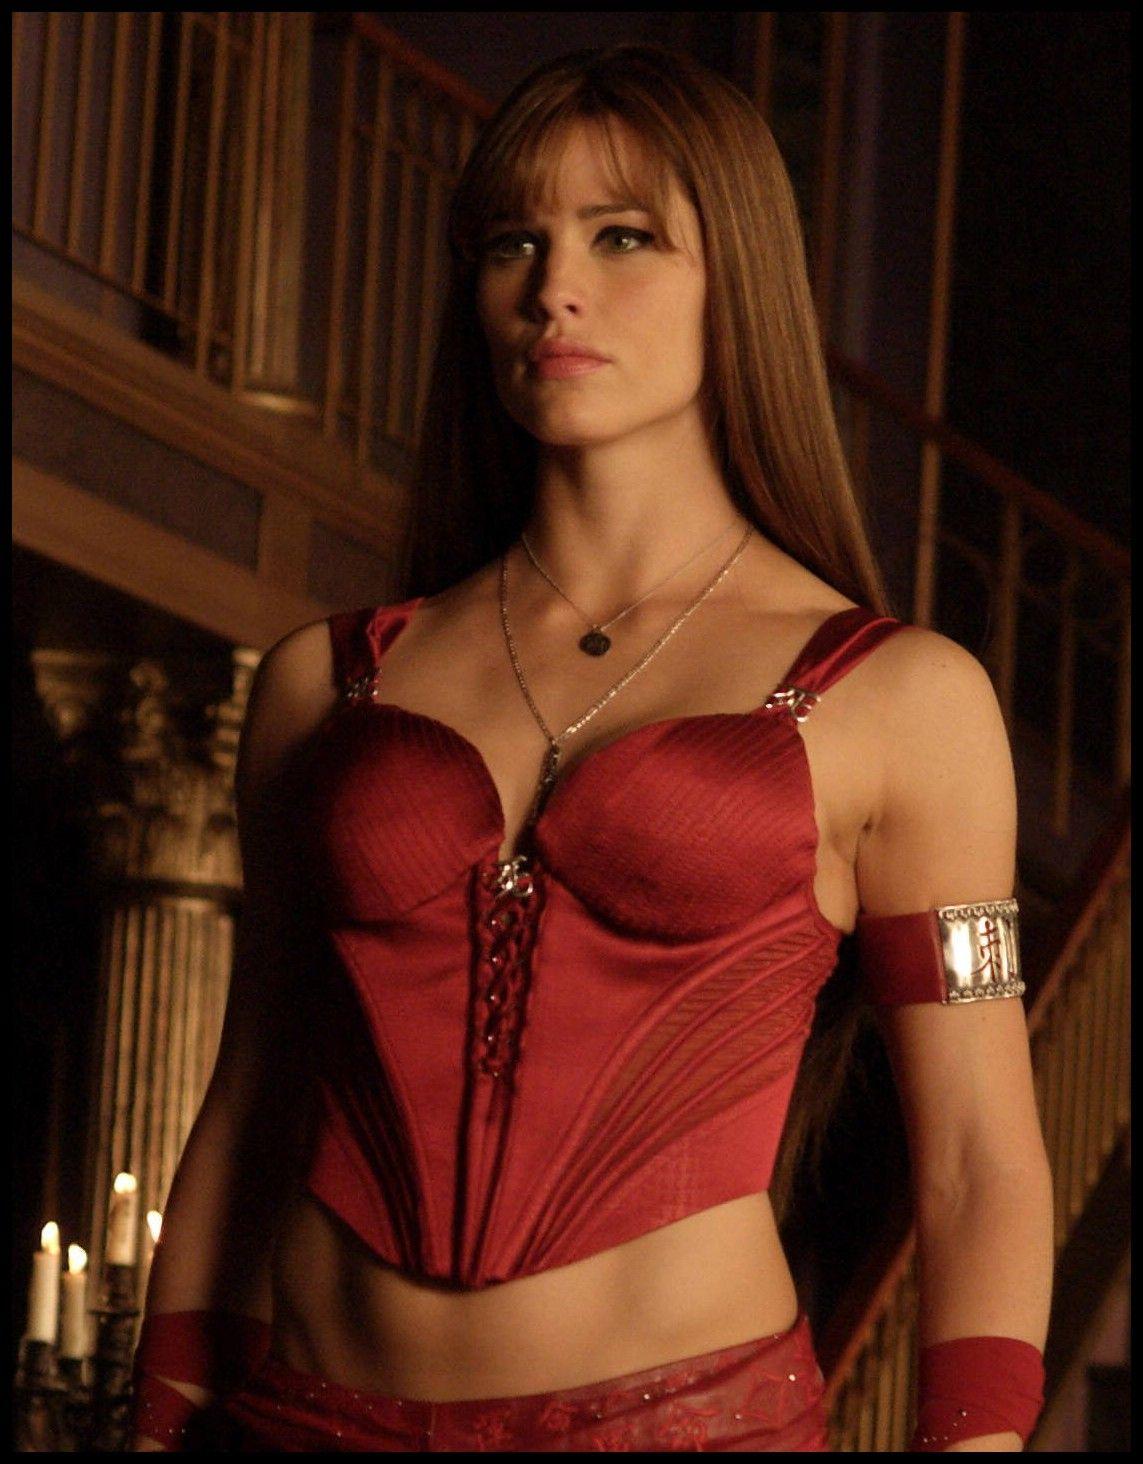 elektra porn Elektra Rose - Life, Bio and Pics | The Lord Of Porn Stars.